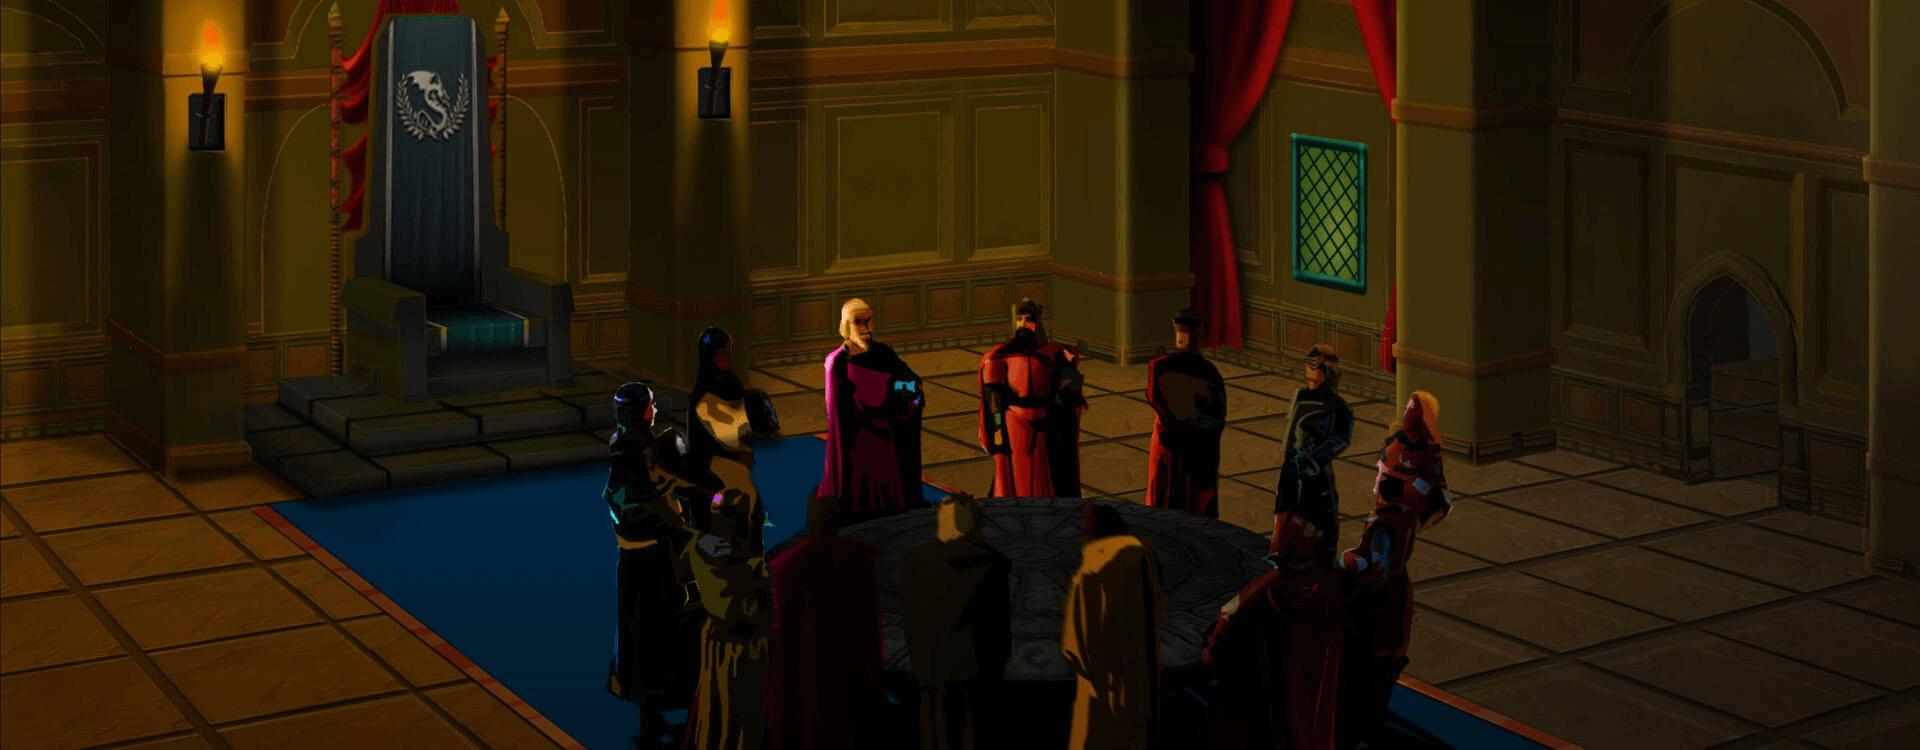 Throne of Lies® The Online Game of Deceit Indie game dev